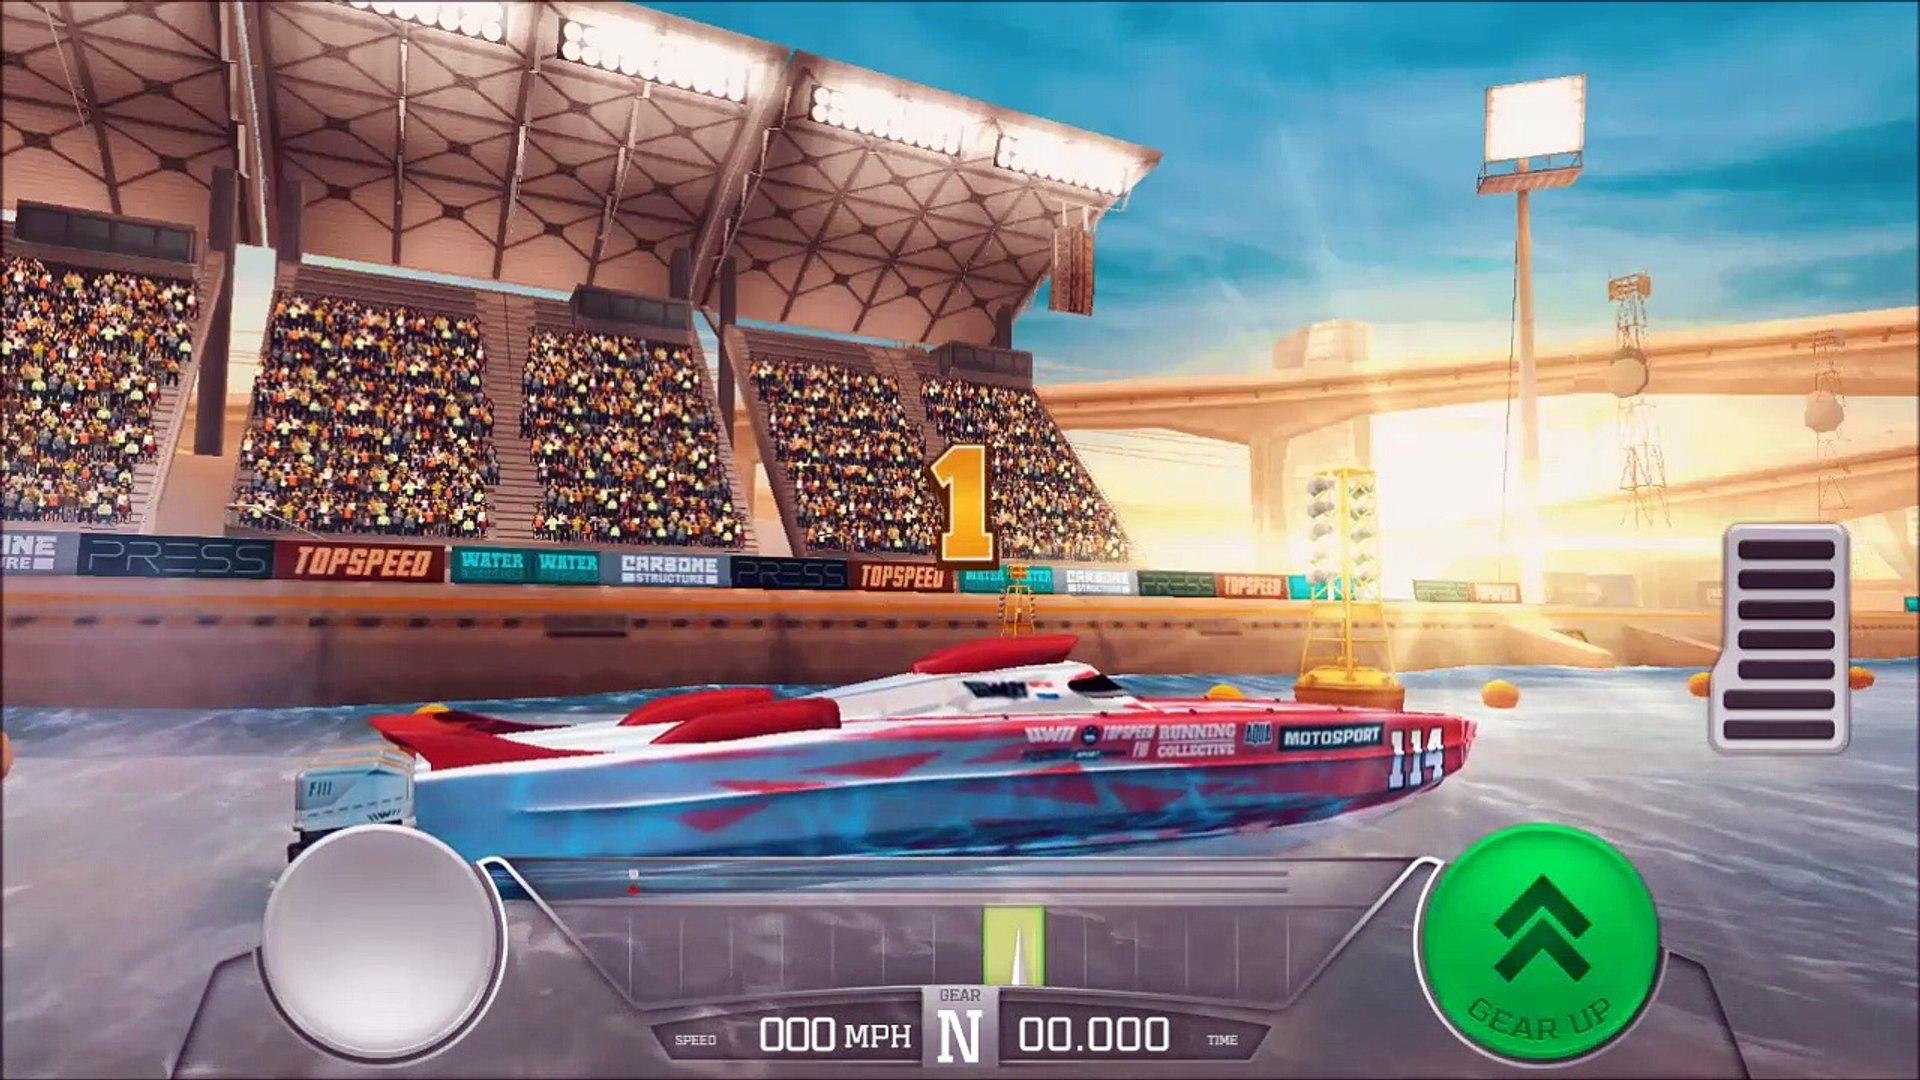 Top Boat Racing Simulator 3d Mod Apk Unlimited Money